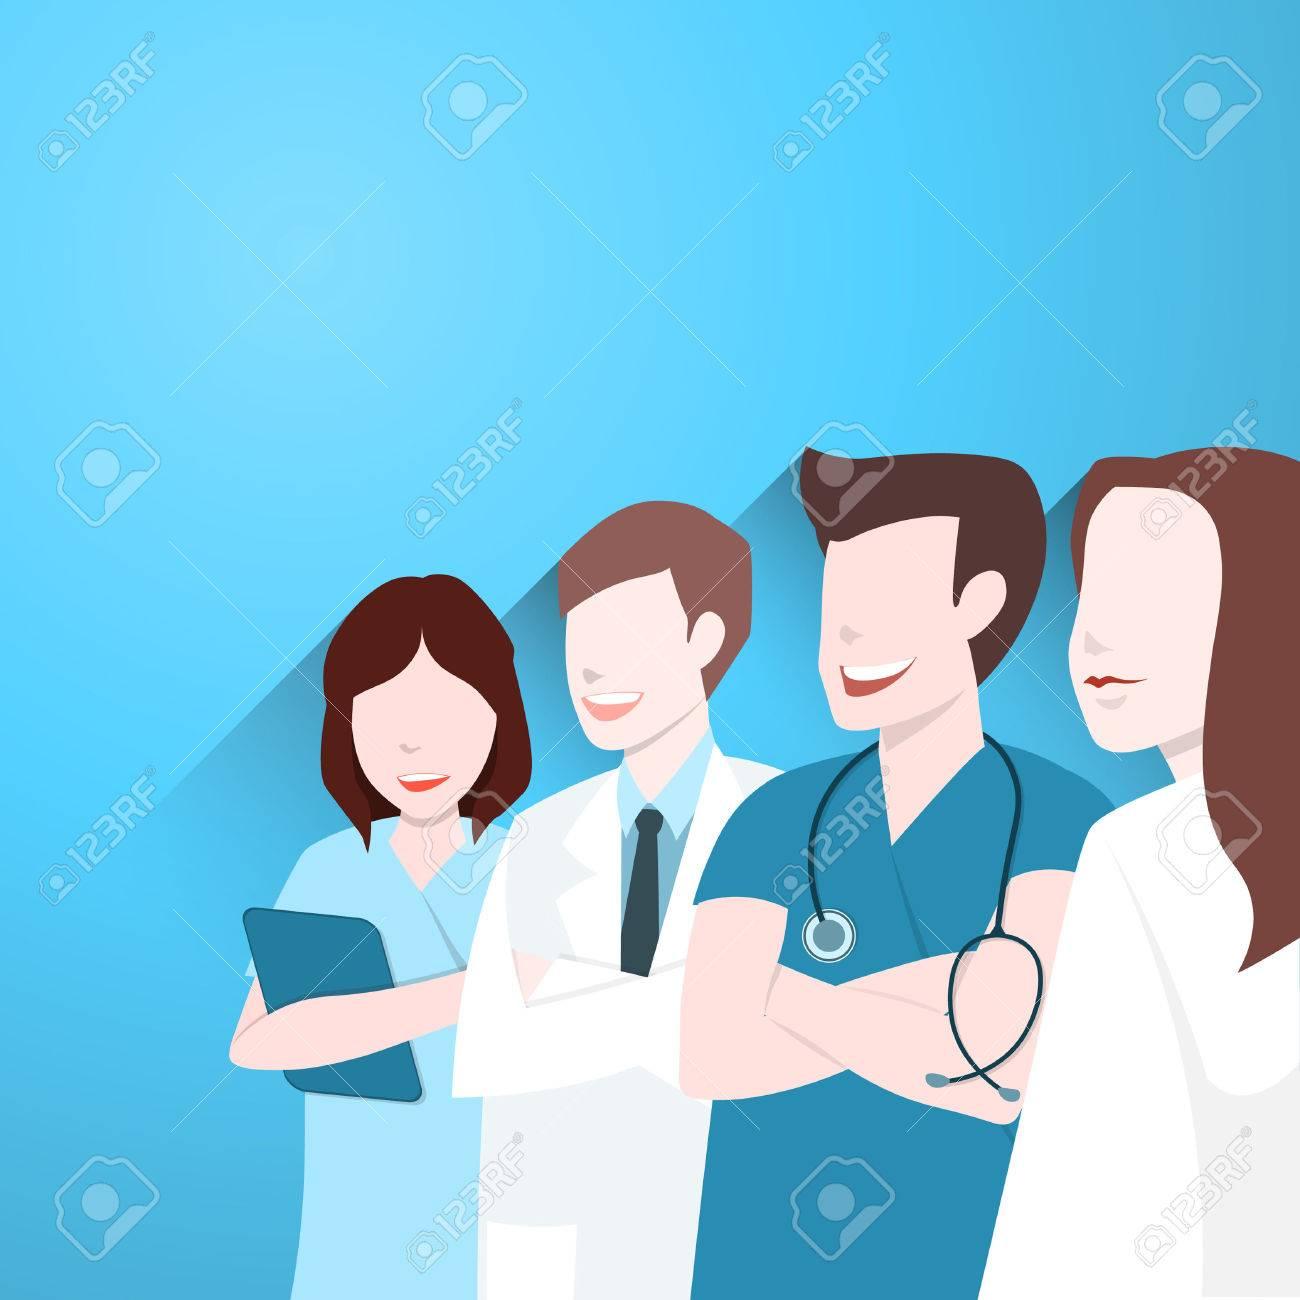 Doctors group, Happy medical team - 55786648